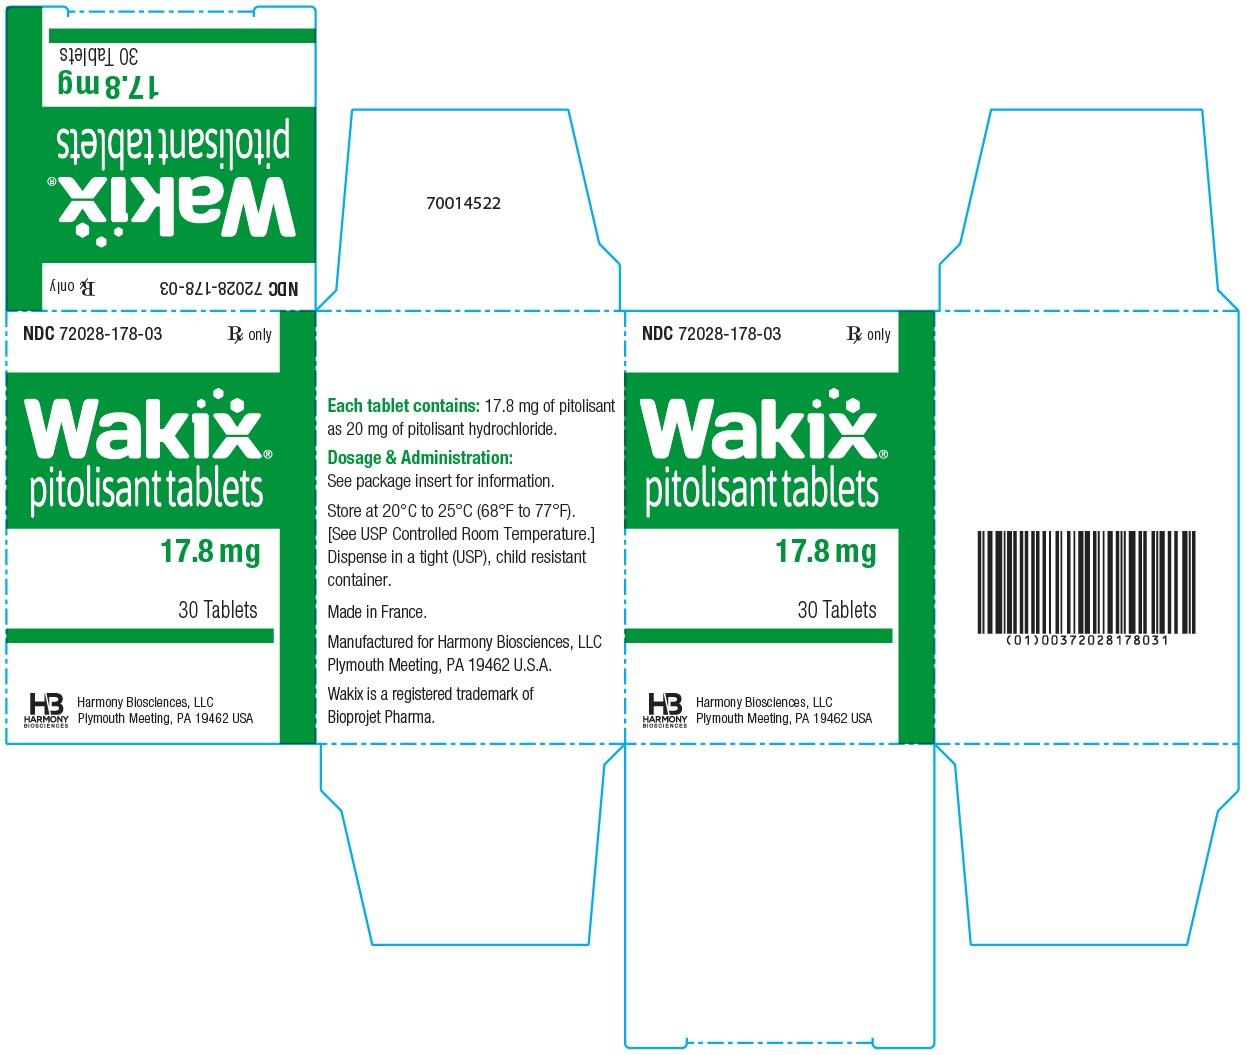 17.8 mg Carton Label